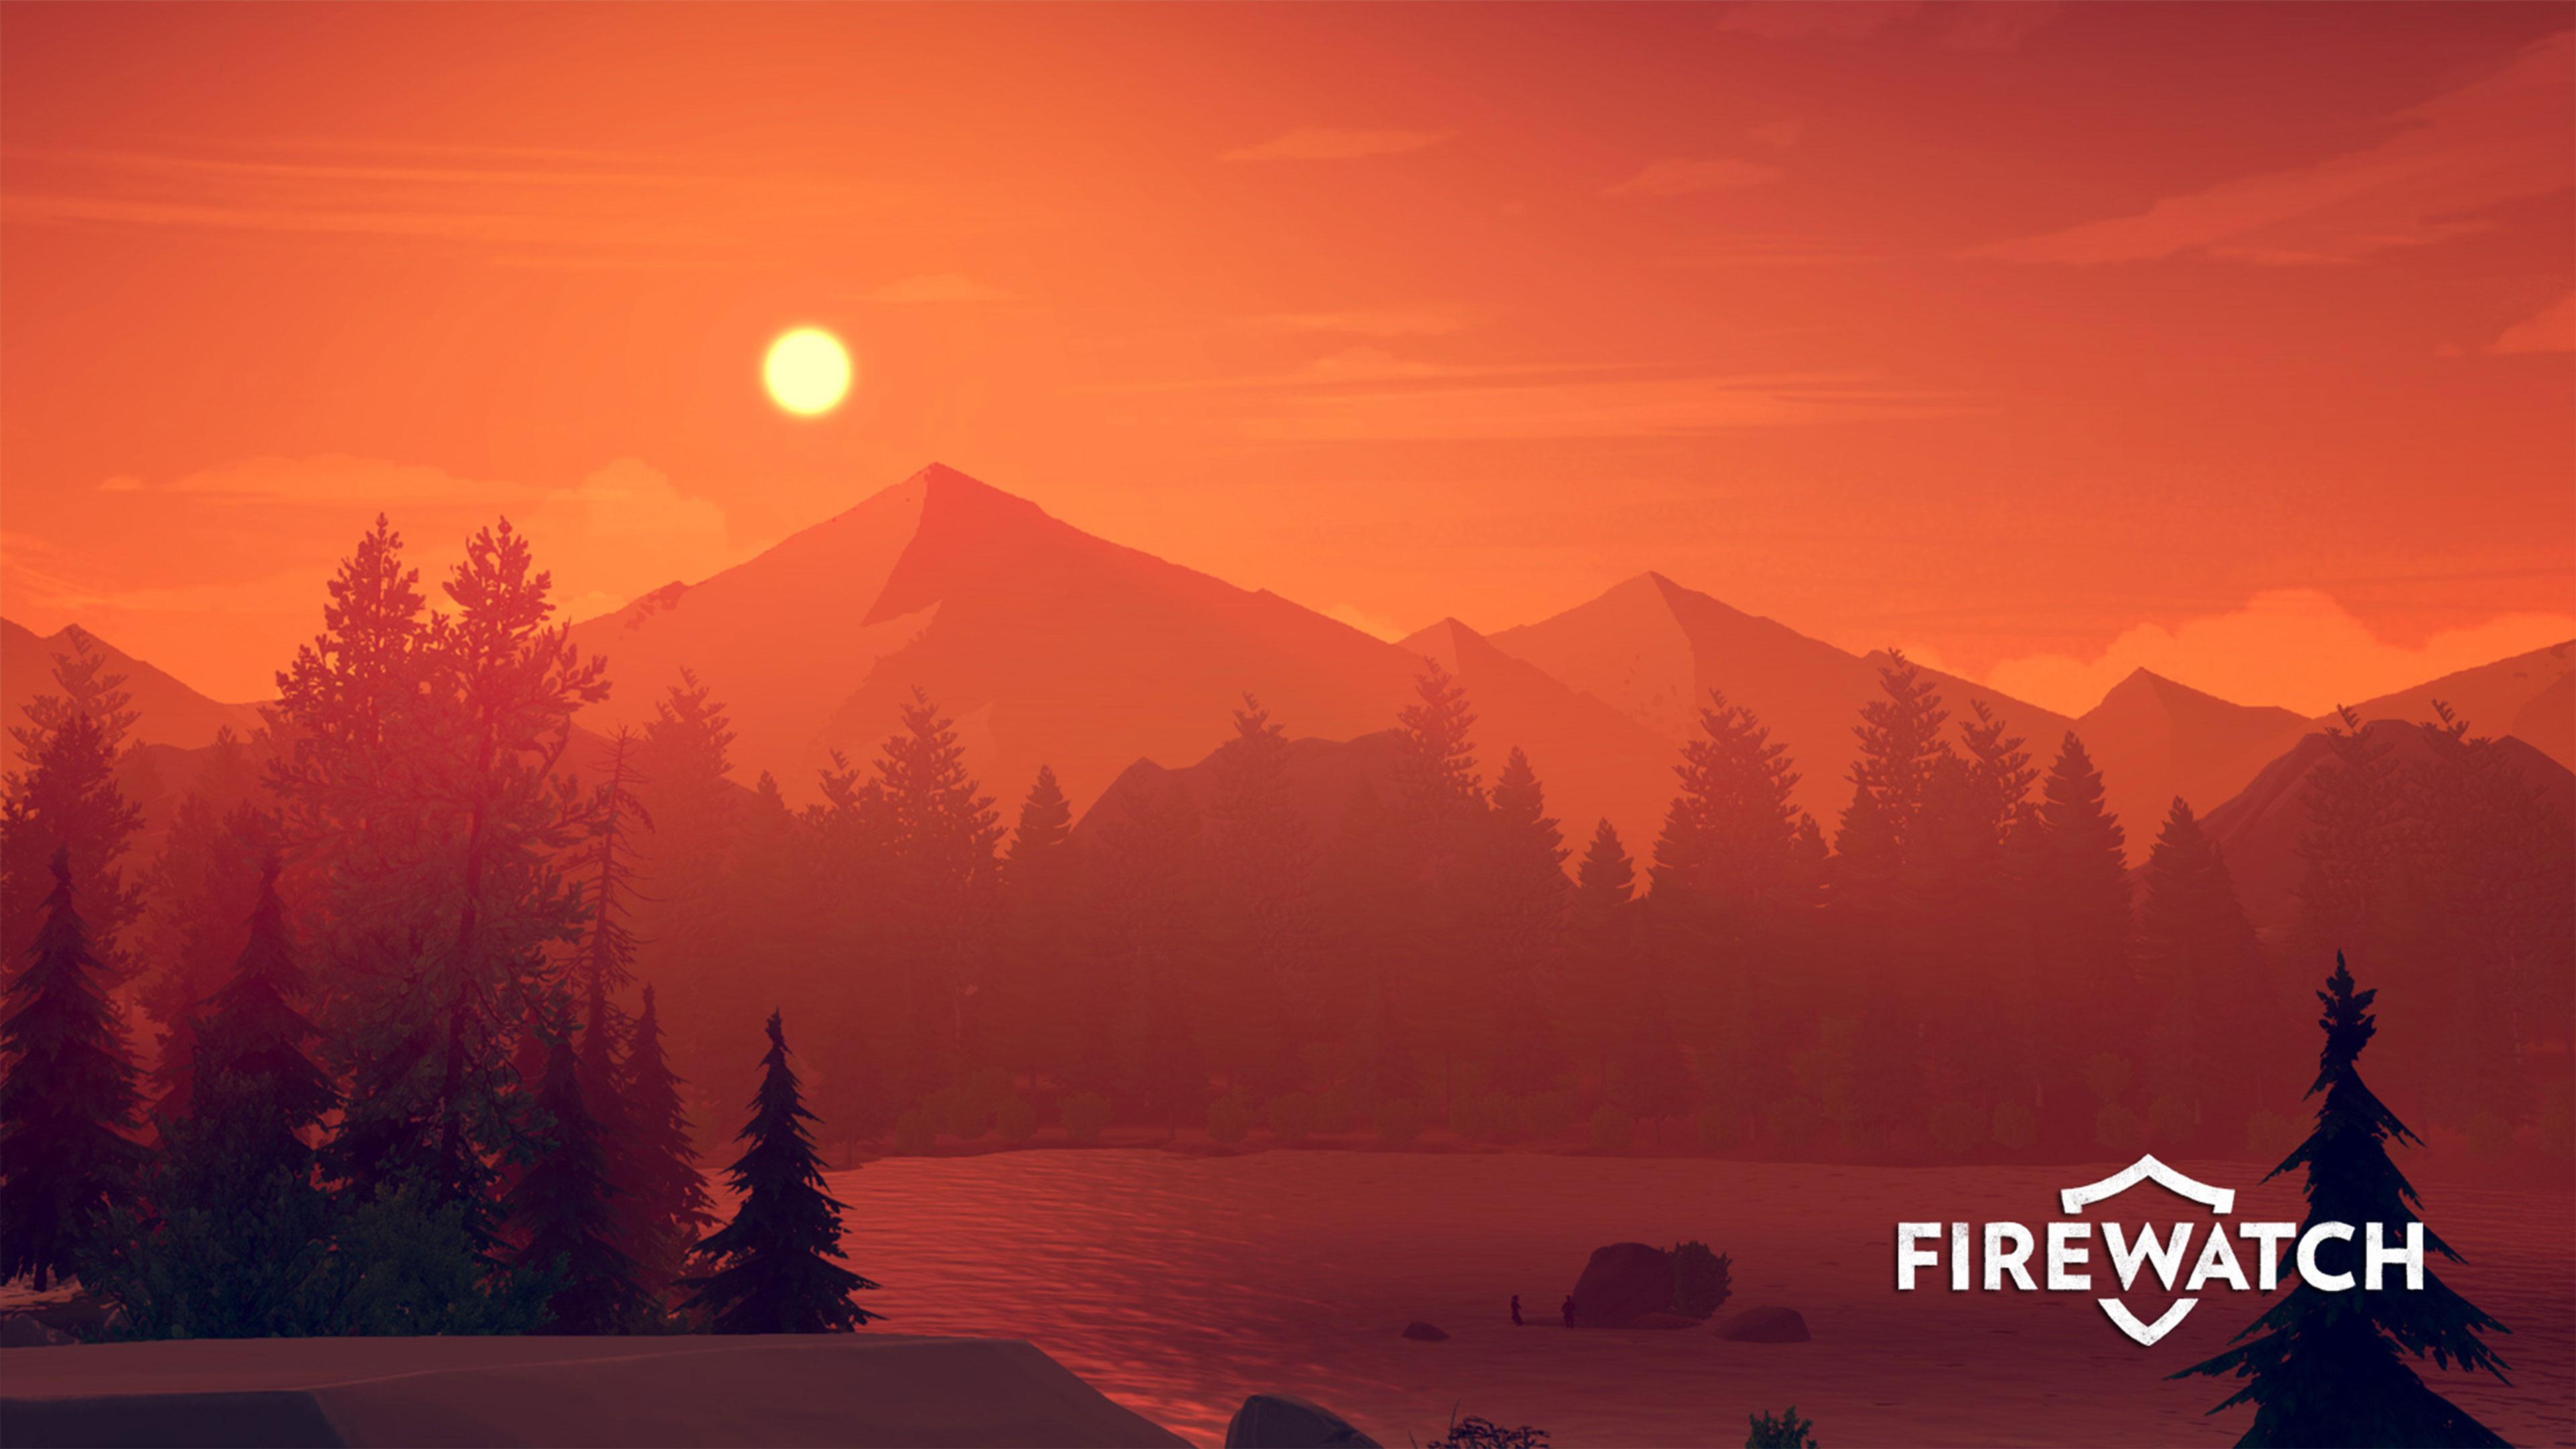 Firewatch Wallpapers In Ultra HD 4K Gameranx